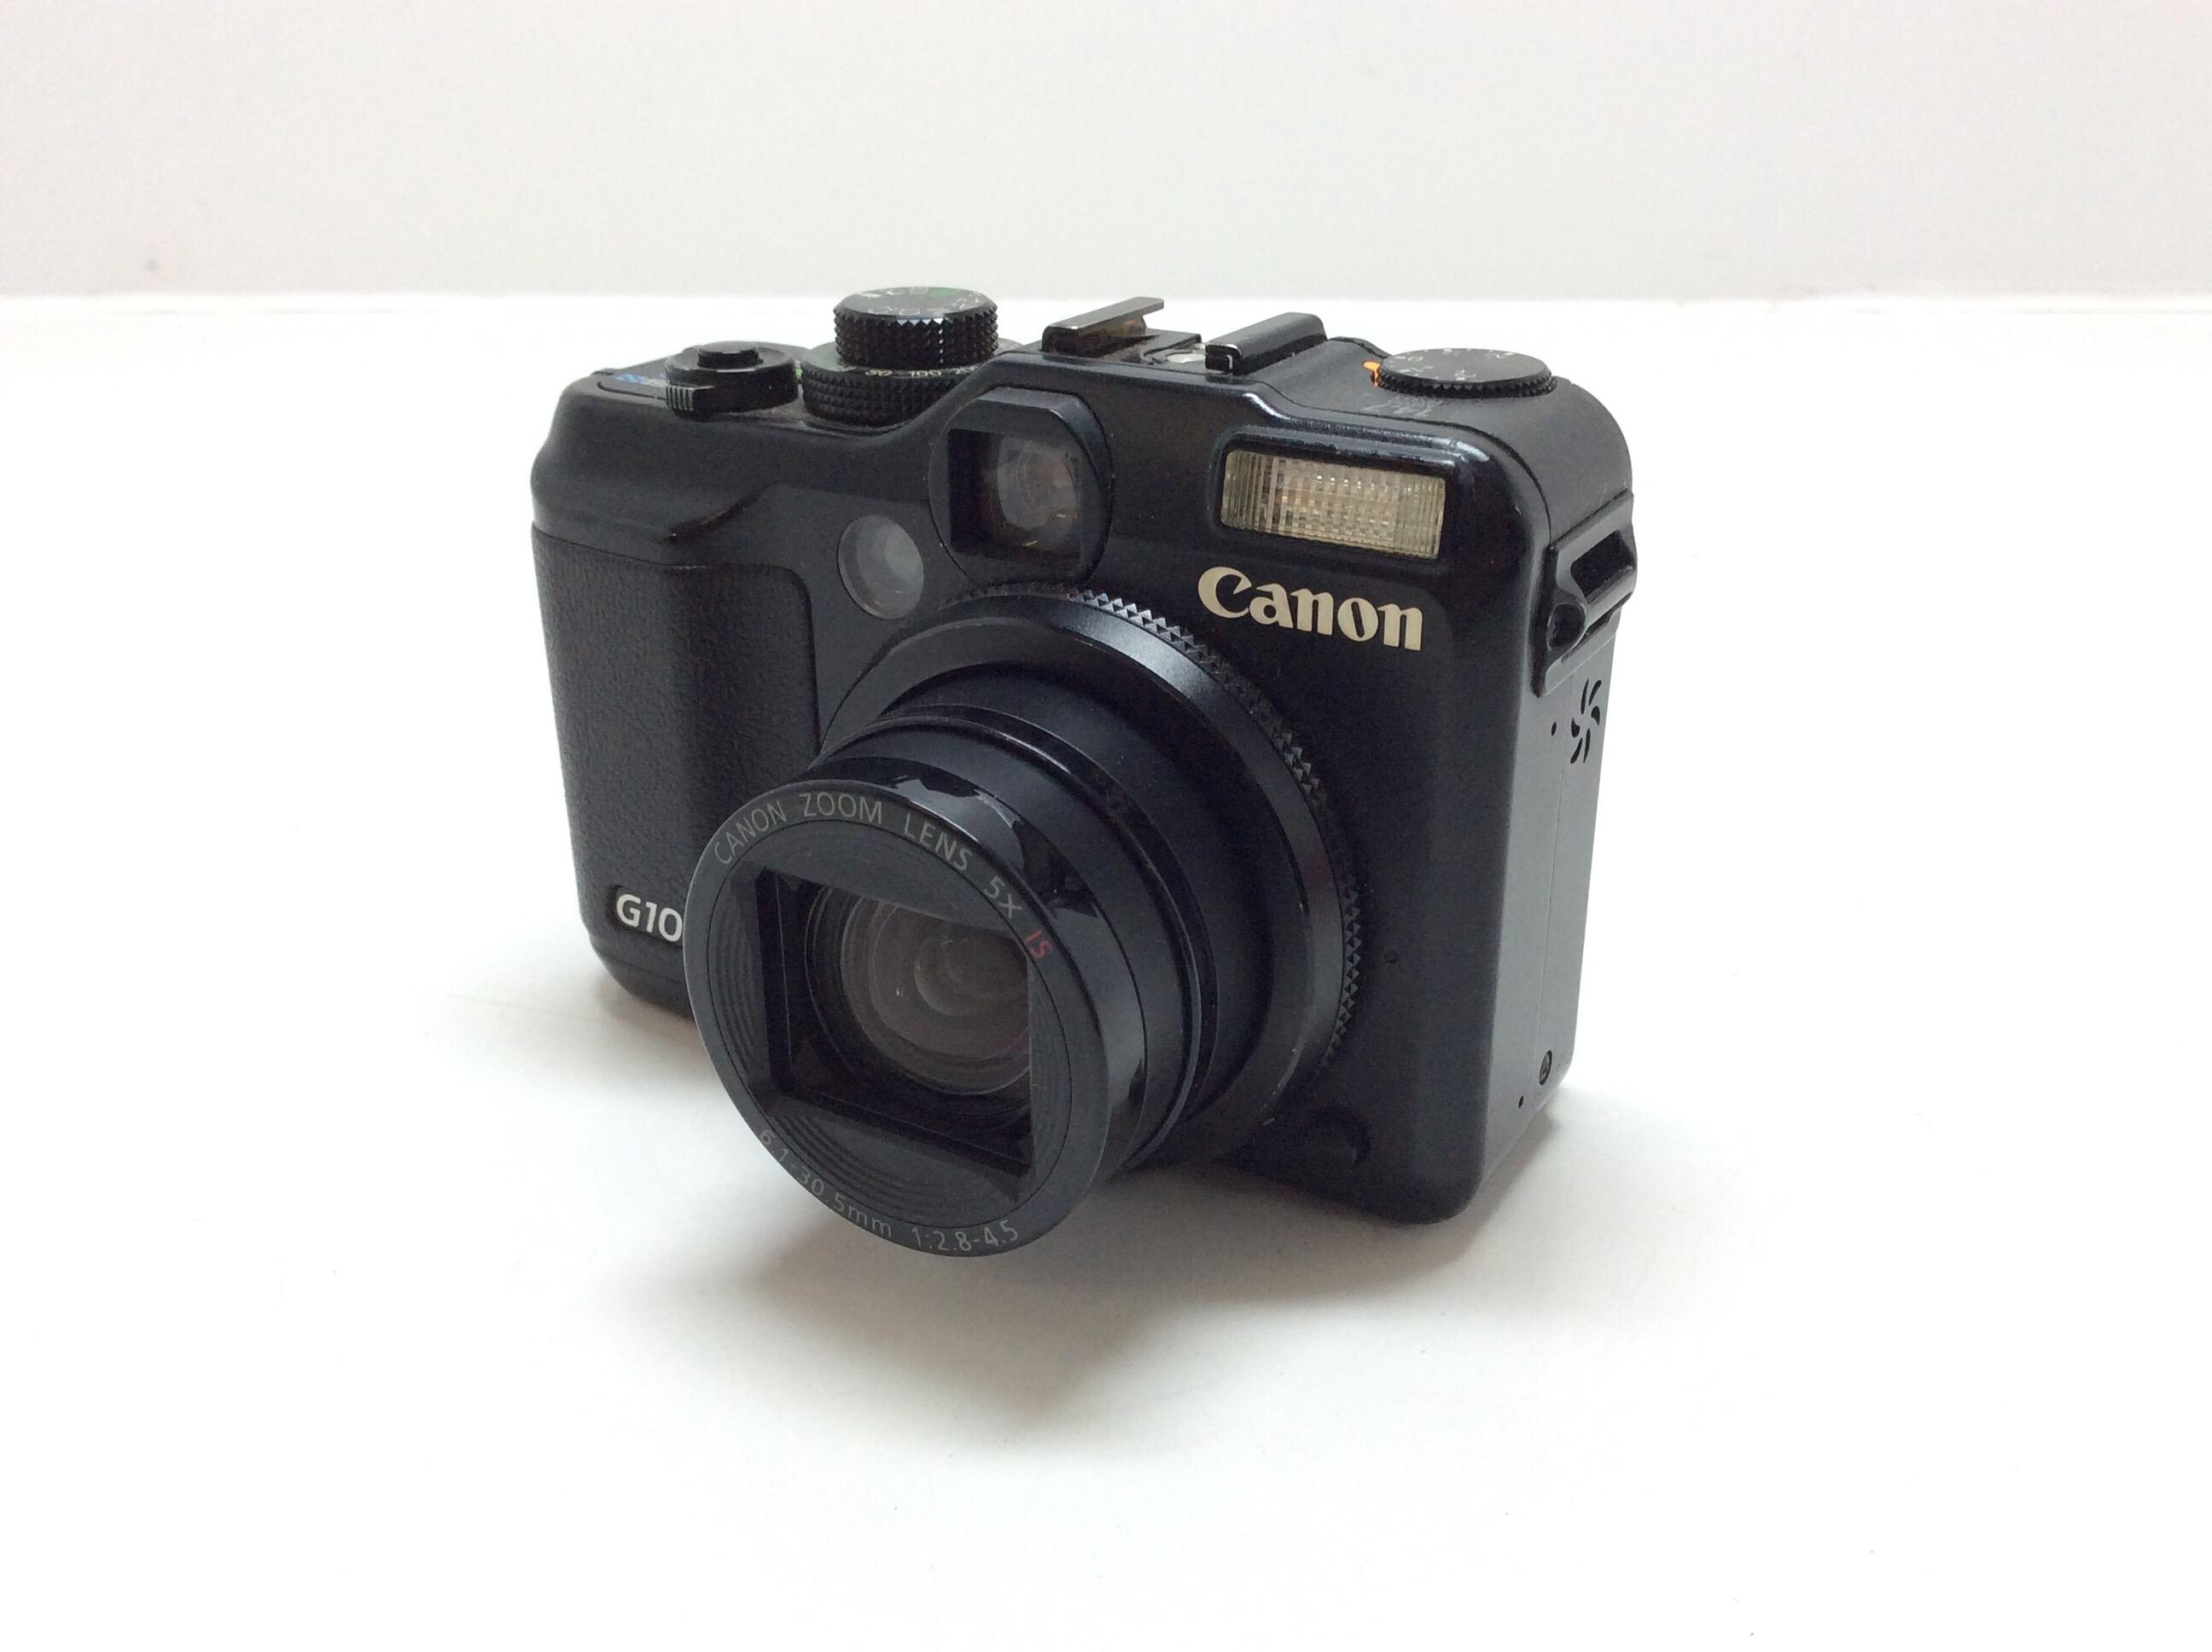 CAMARA DIGITAL EVIL CANON G10